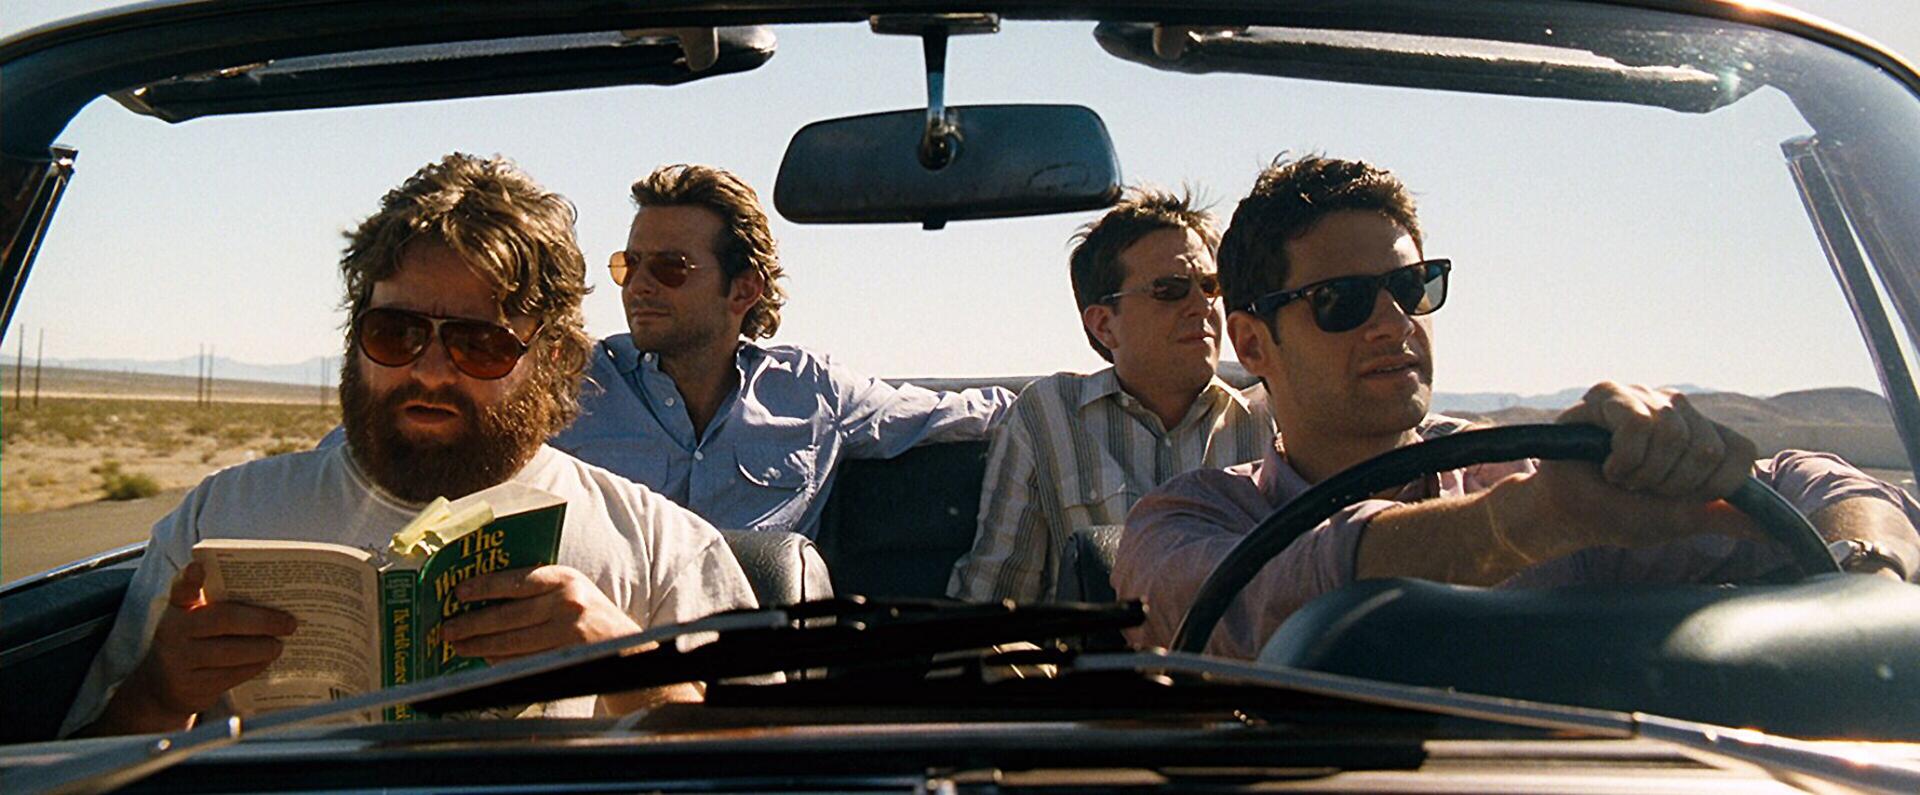 The Hangover (2010) – 67ª edición.Dirigida por Todd Phillips.Ganó un Globo de Orocomo mejor comedia